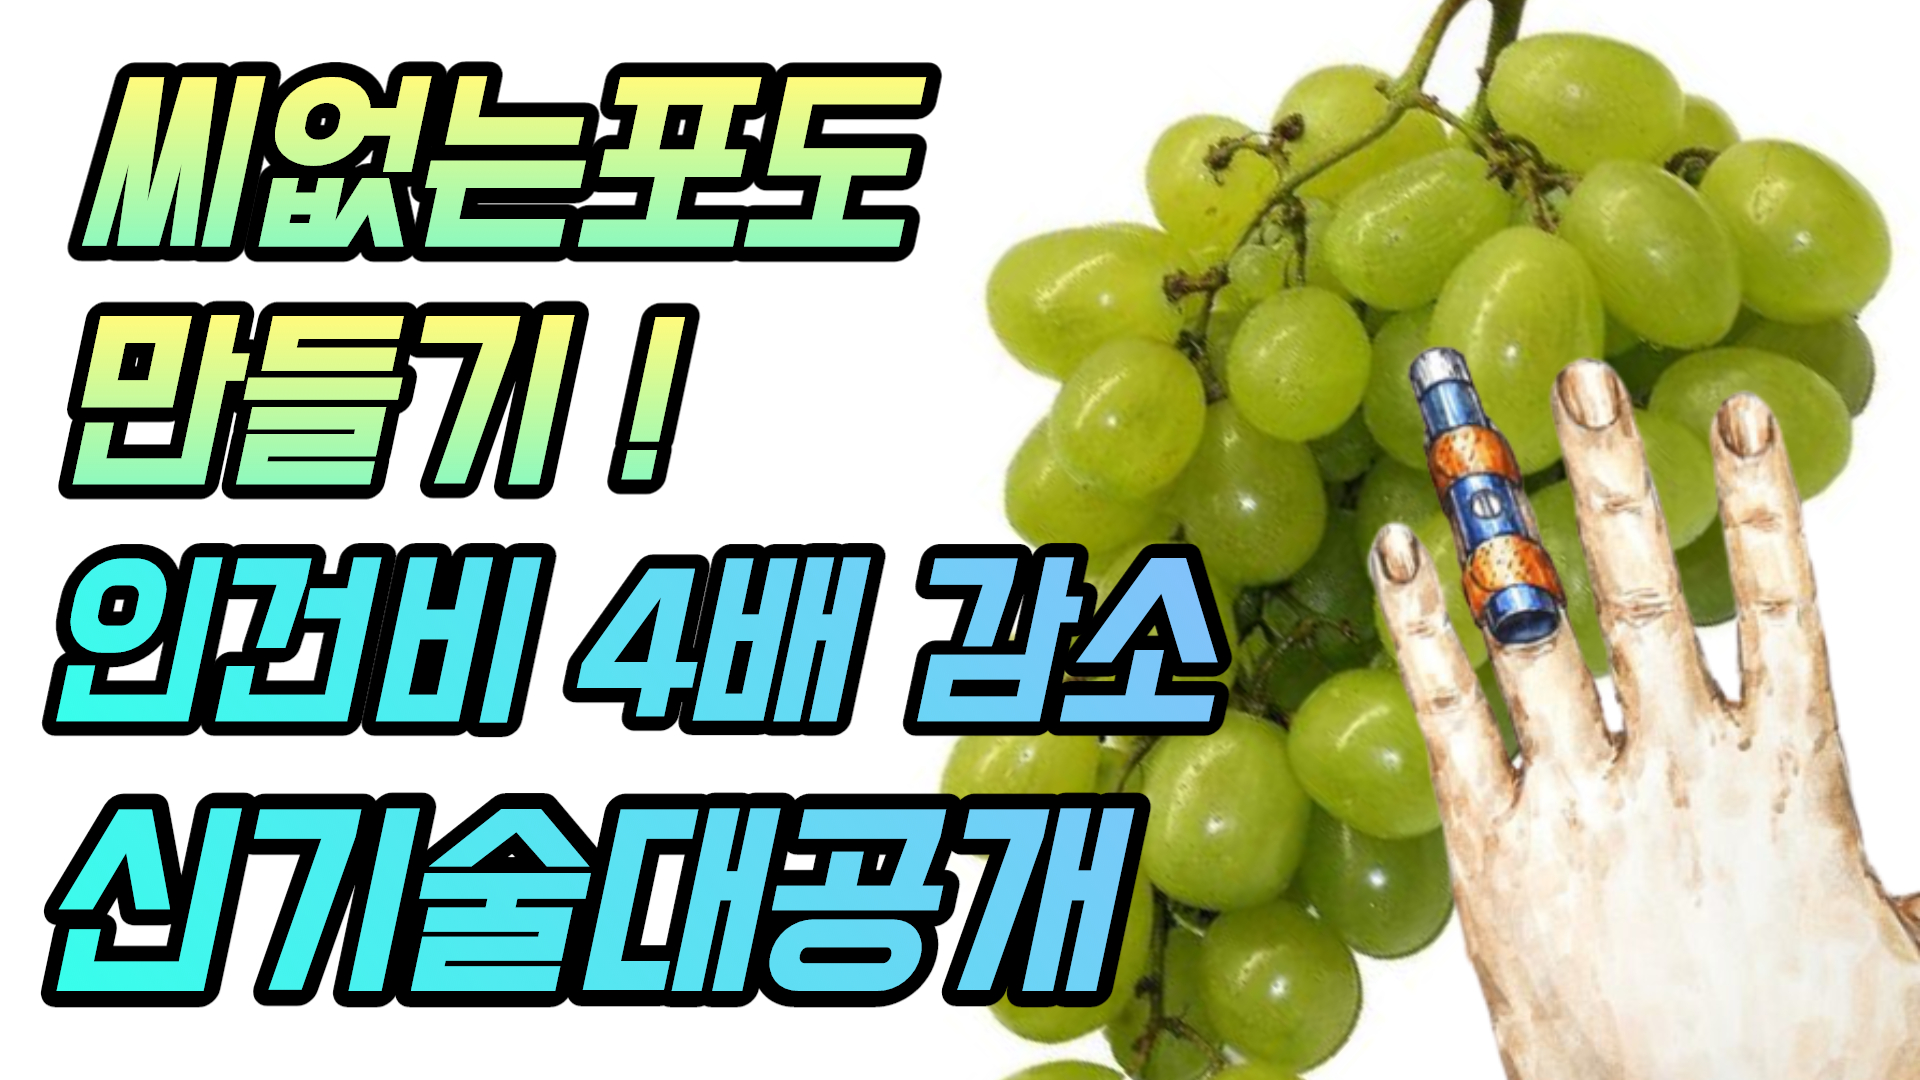 (with 귀농의신) 포도 생장조정제 처리표식기